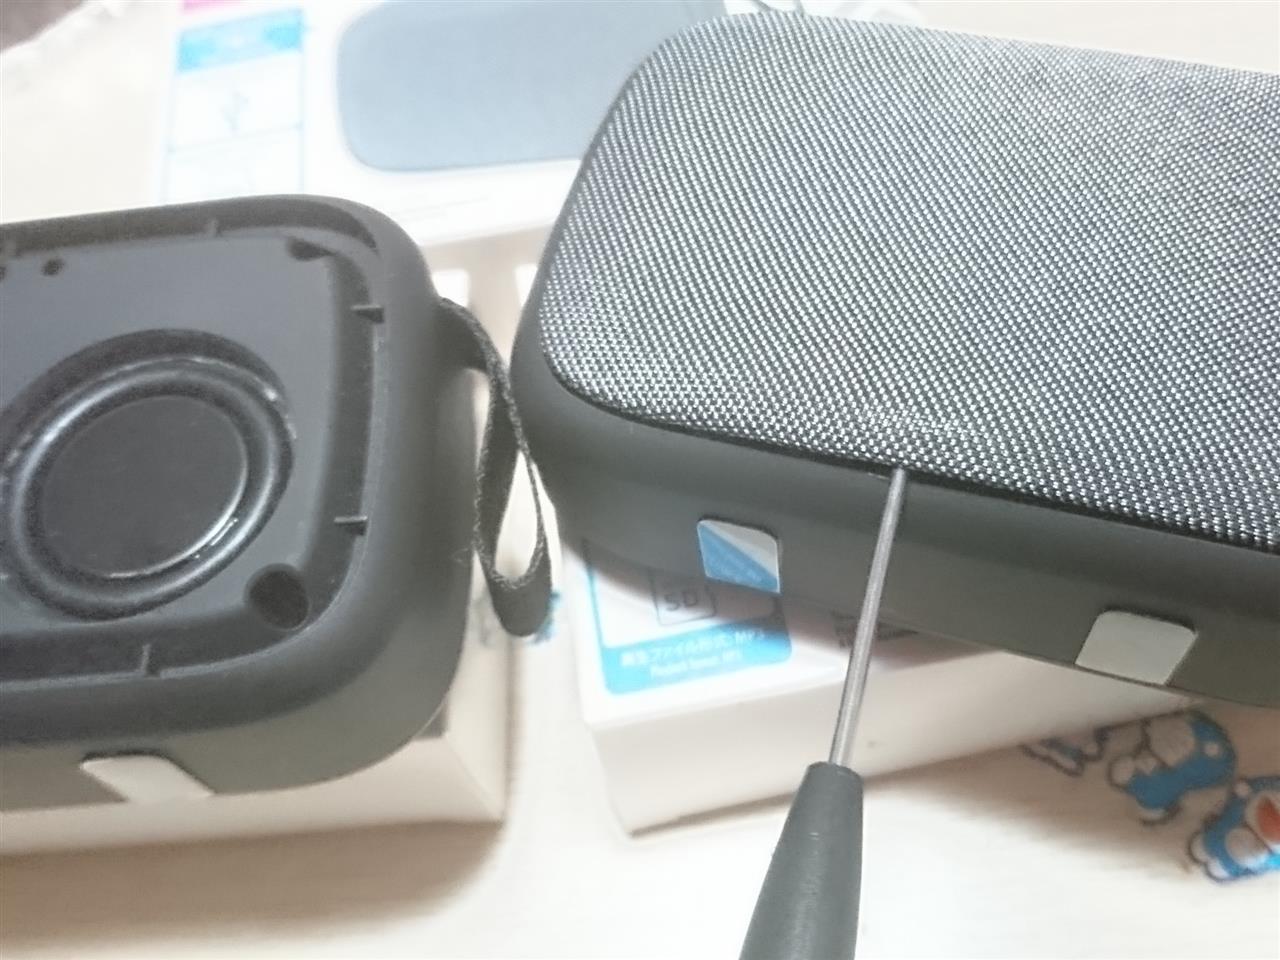 SR9910型 - ダイソー500円Bluetoothスピーカー ...